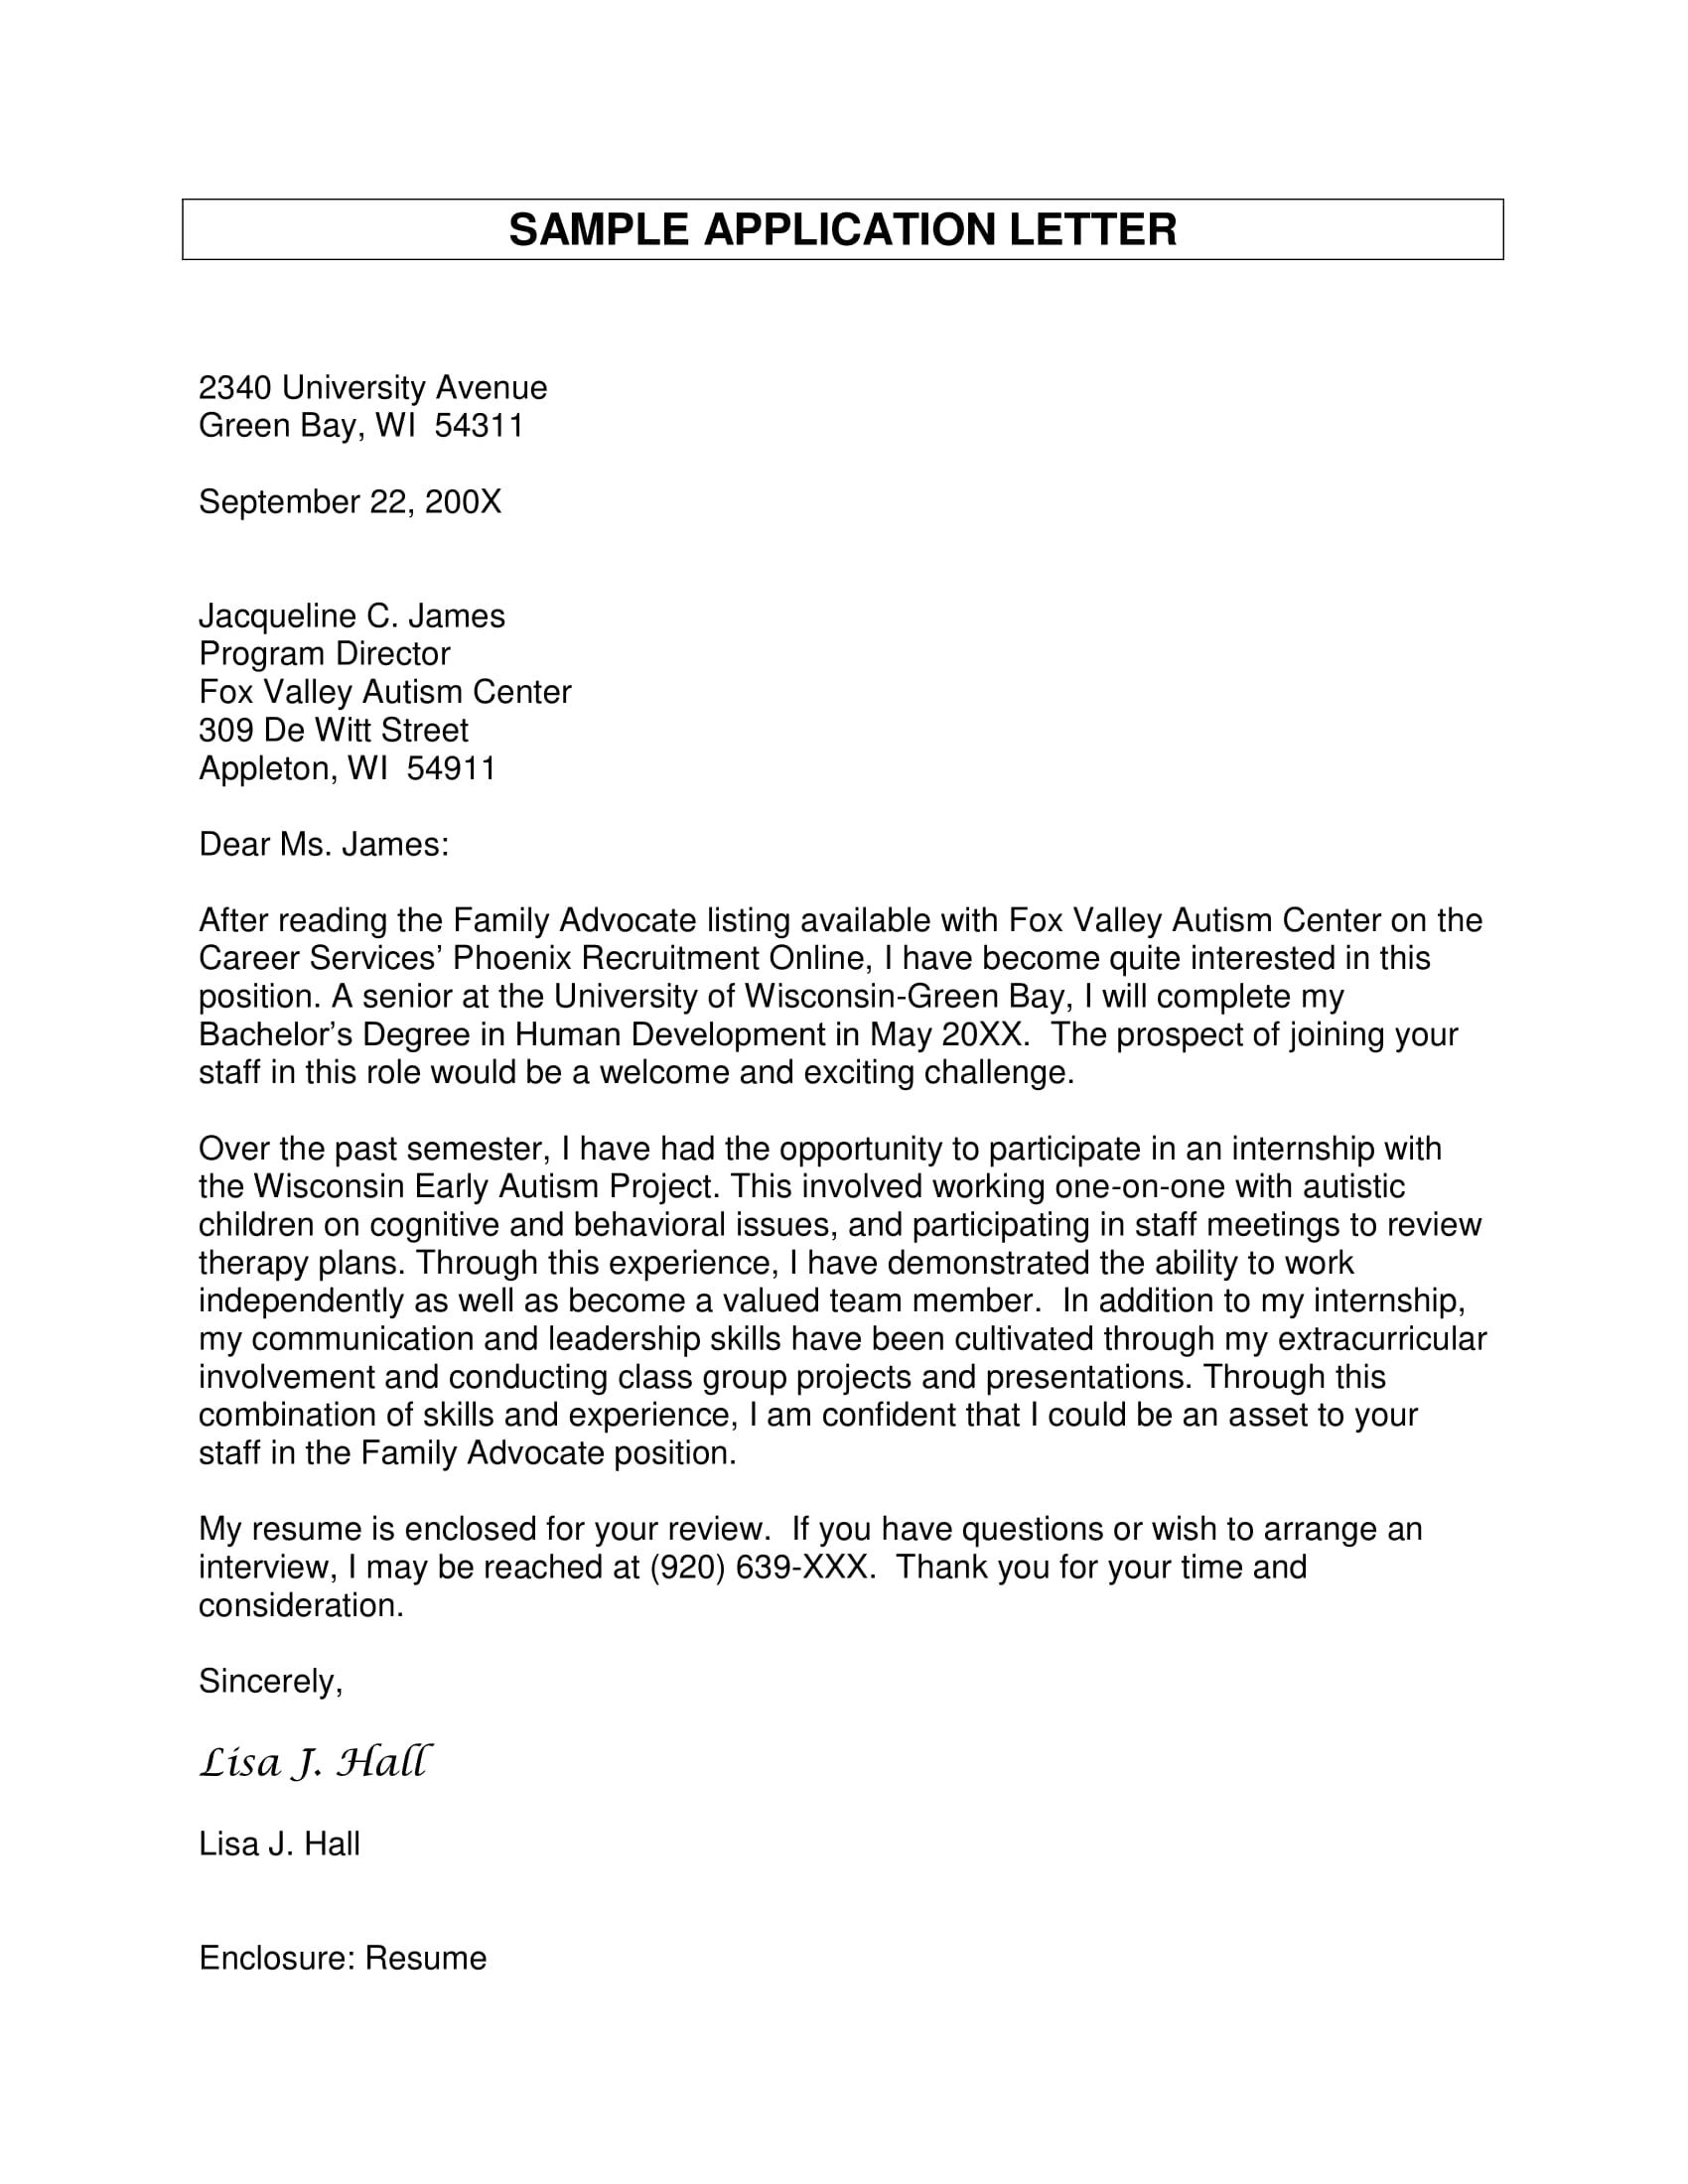 a sample letter